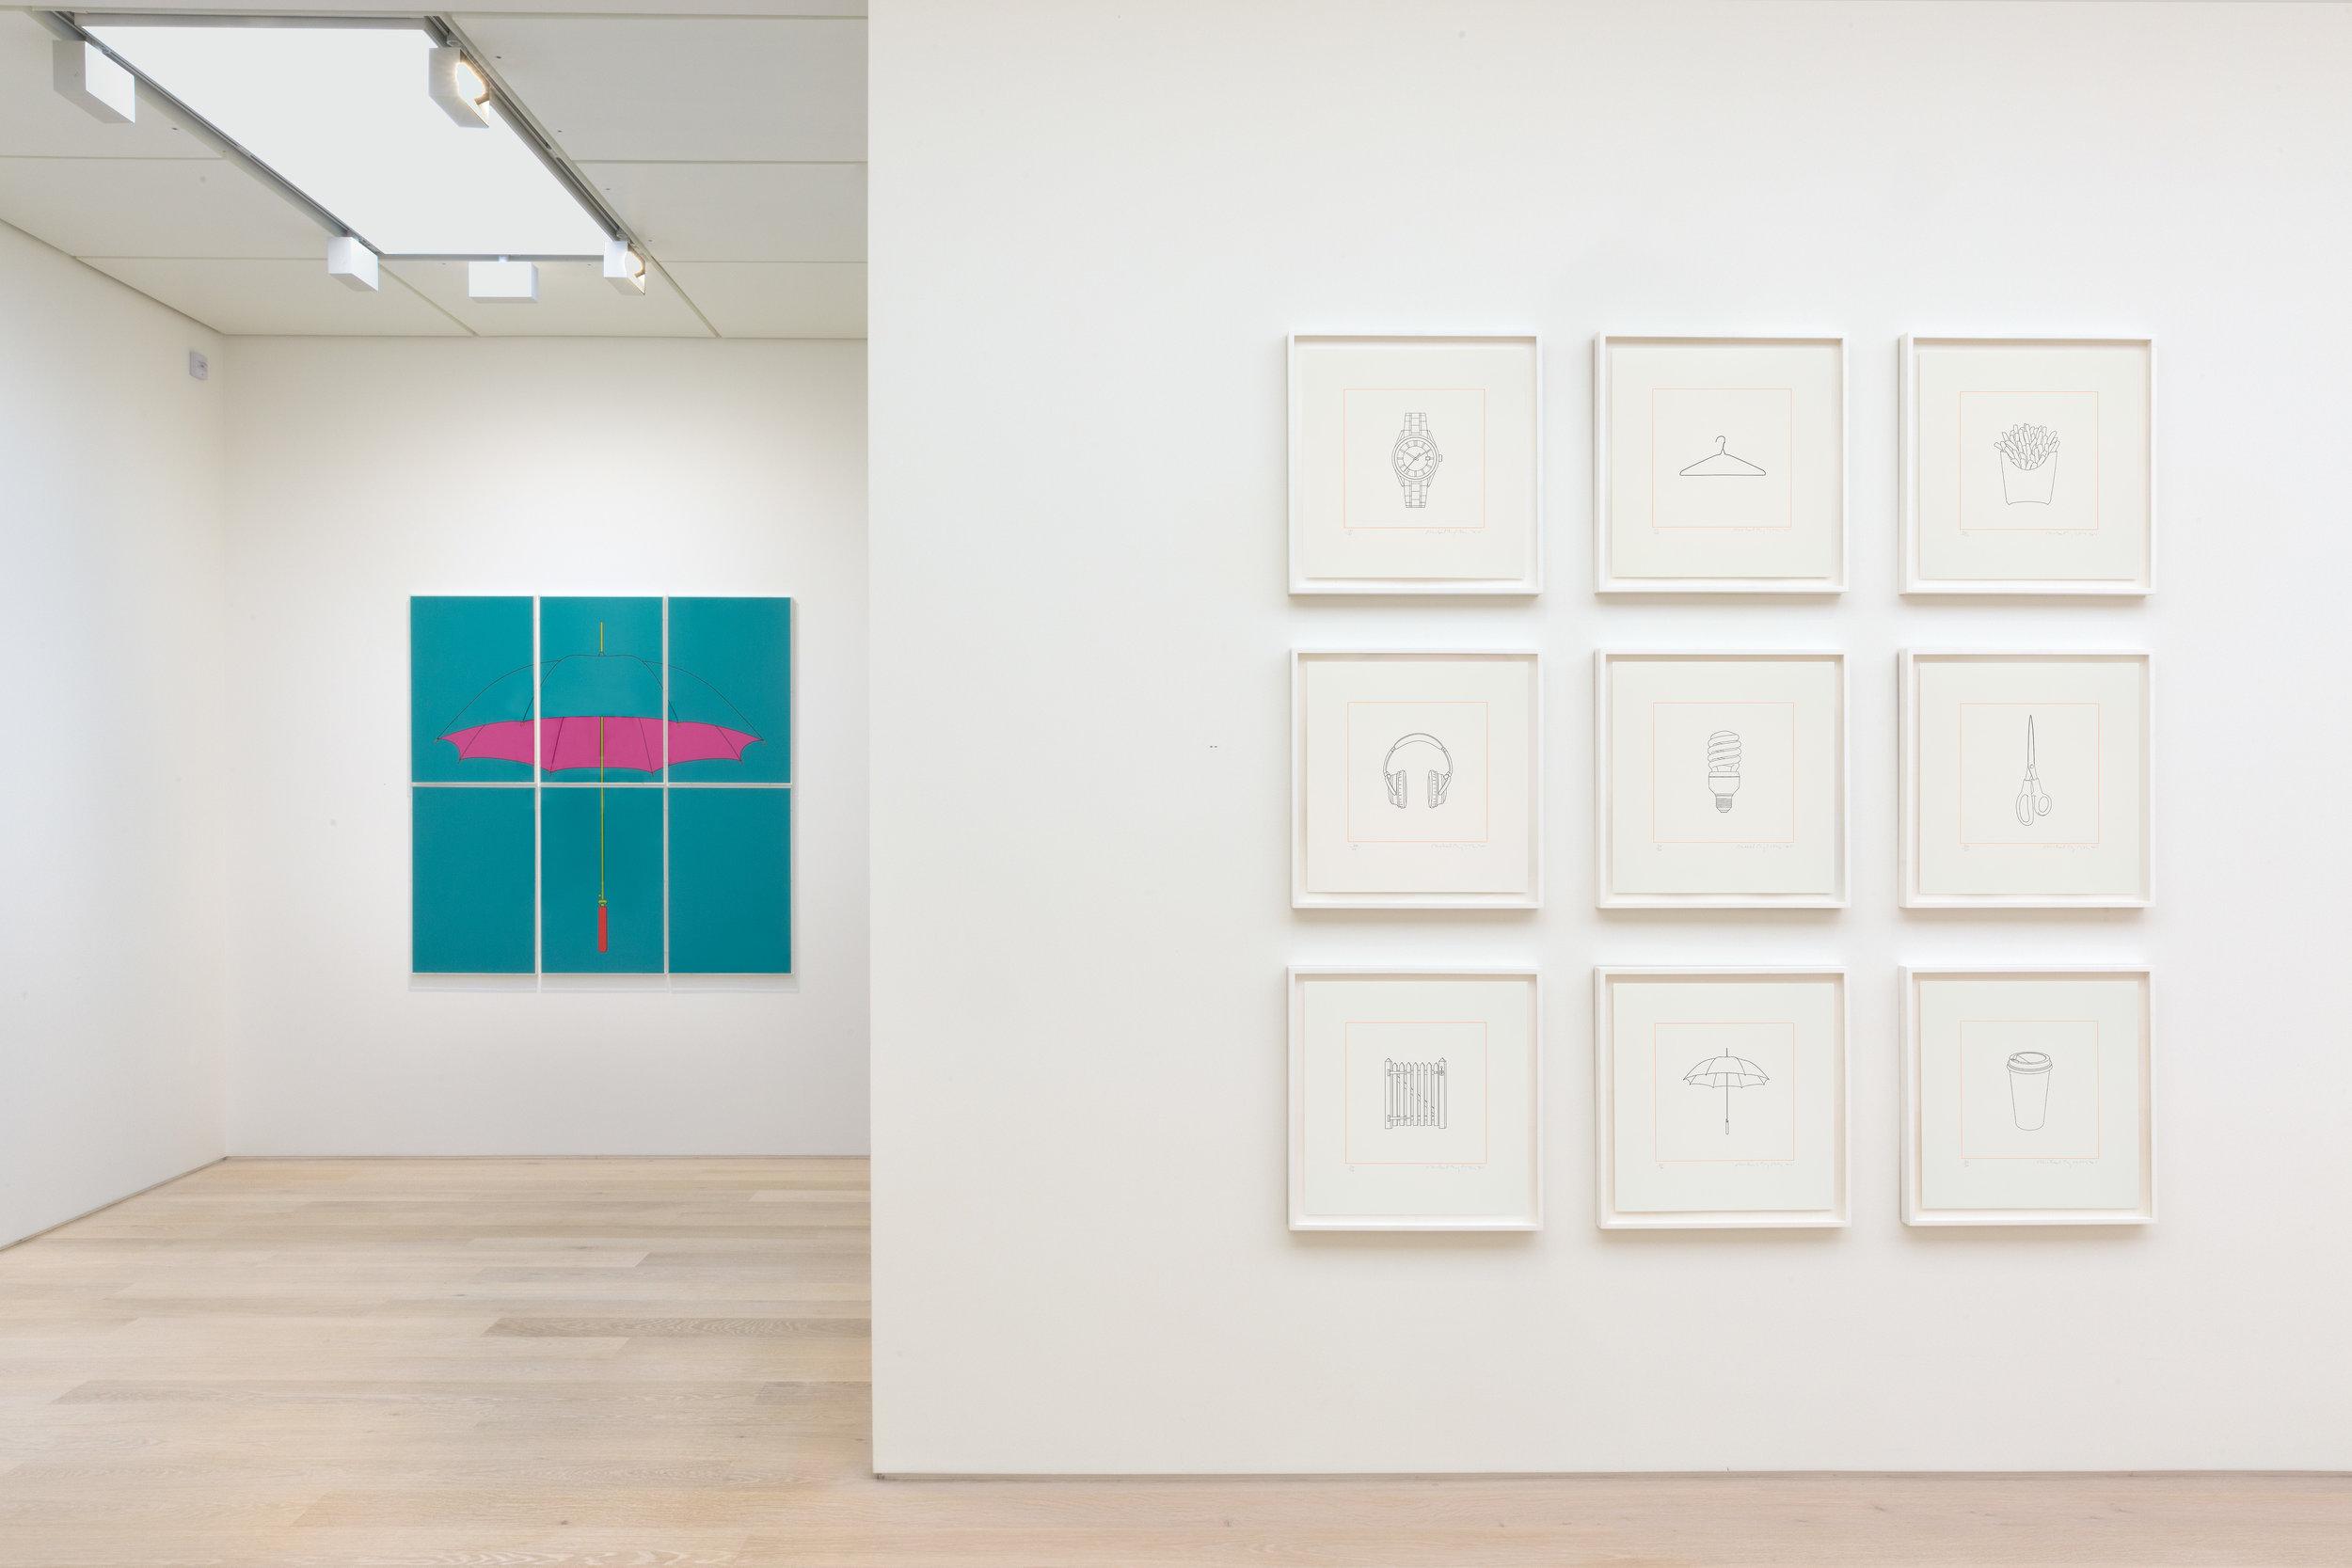 Michael Craig-Martin Quotidian_Alan Cristea Gallery 2017 installation. Photo FXP Photography (6)~hi.jpg